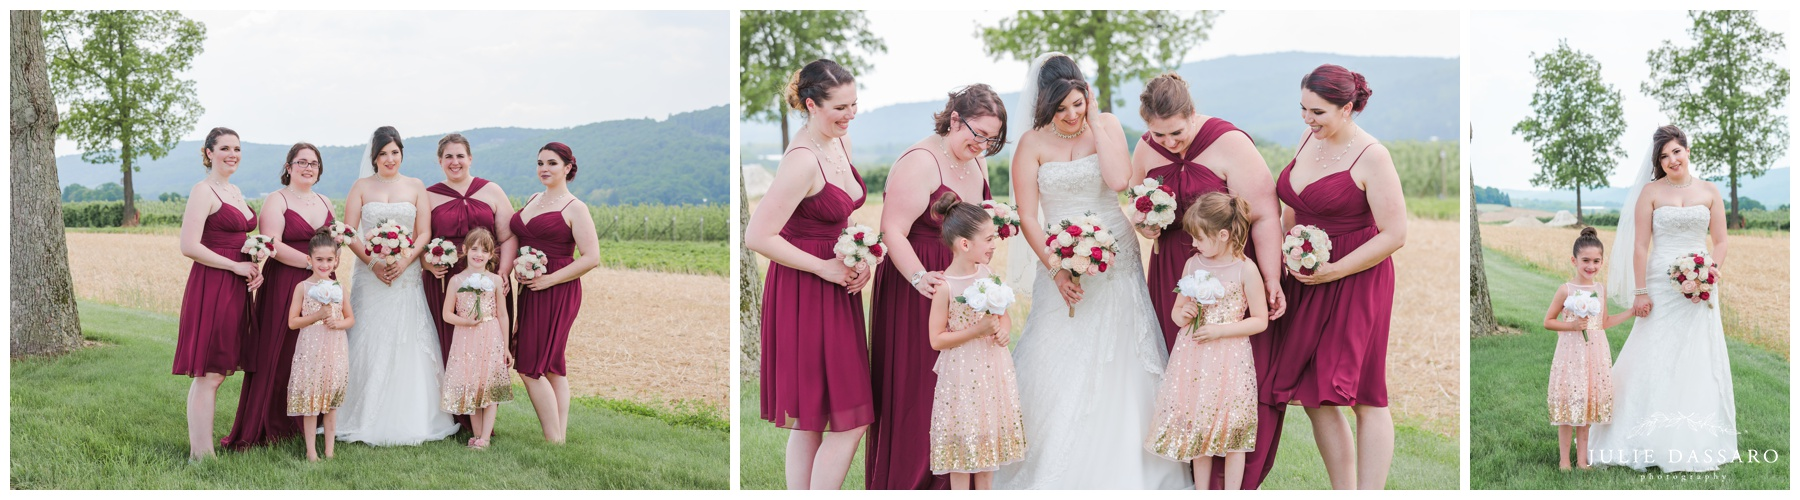 bridesmaids in cranberry dresses